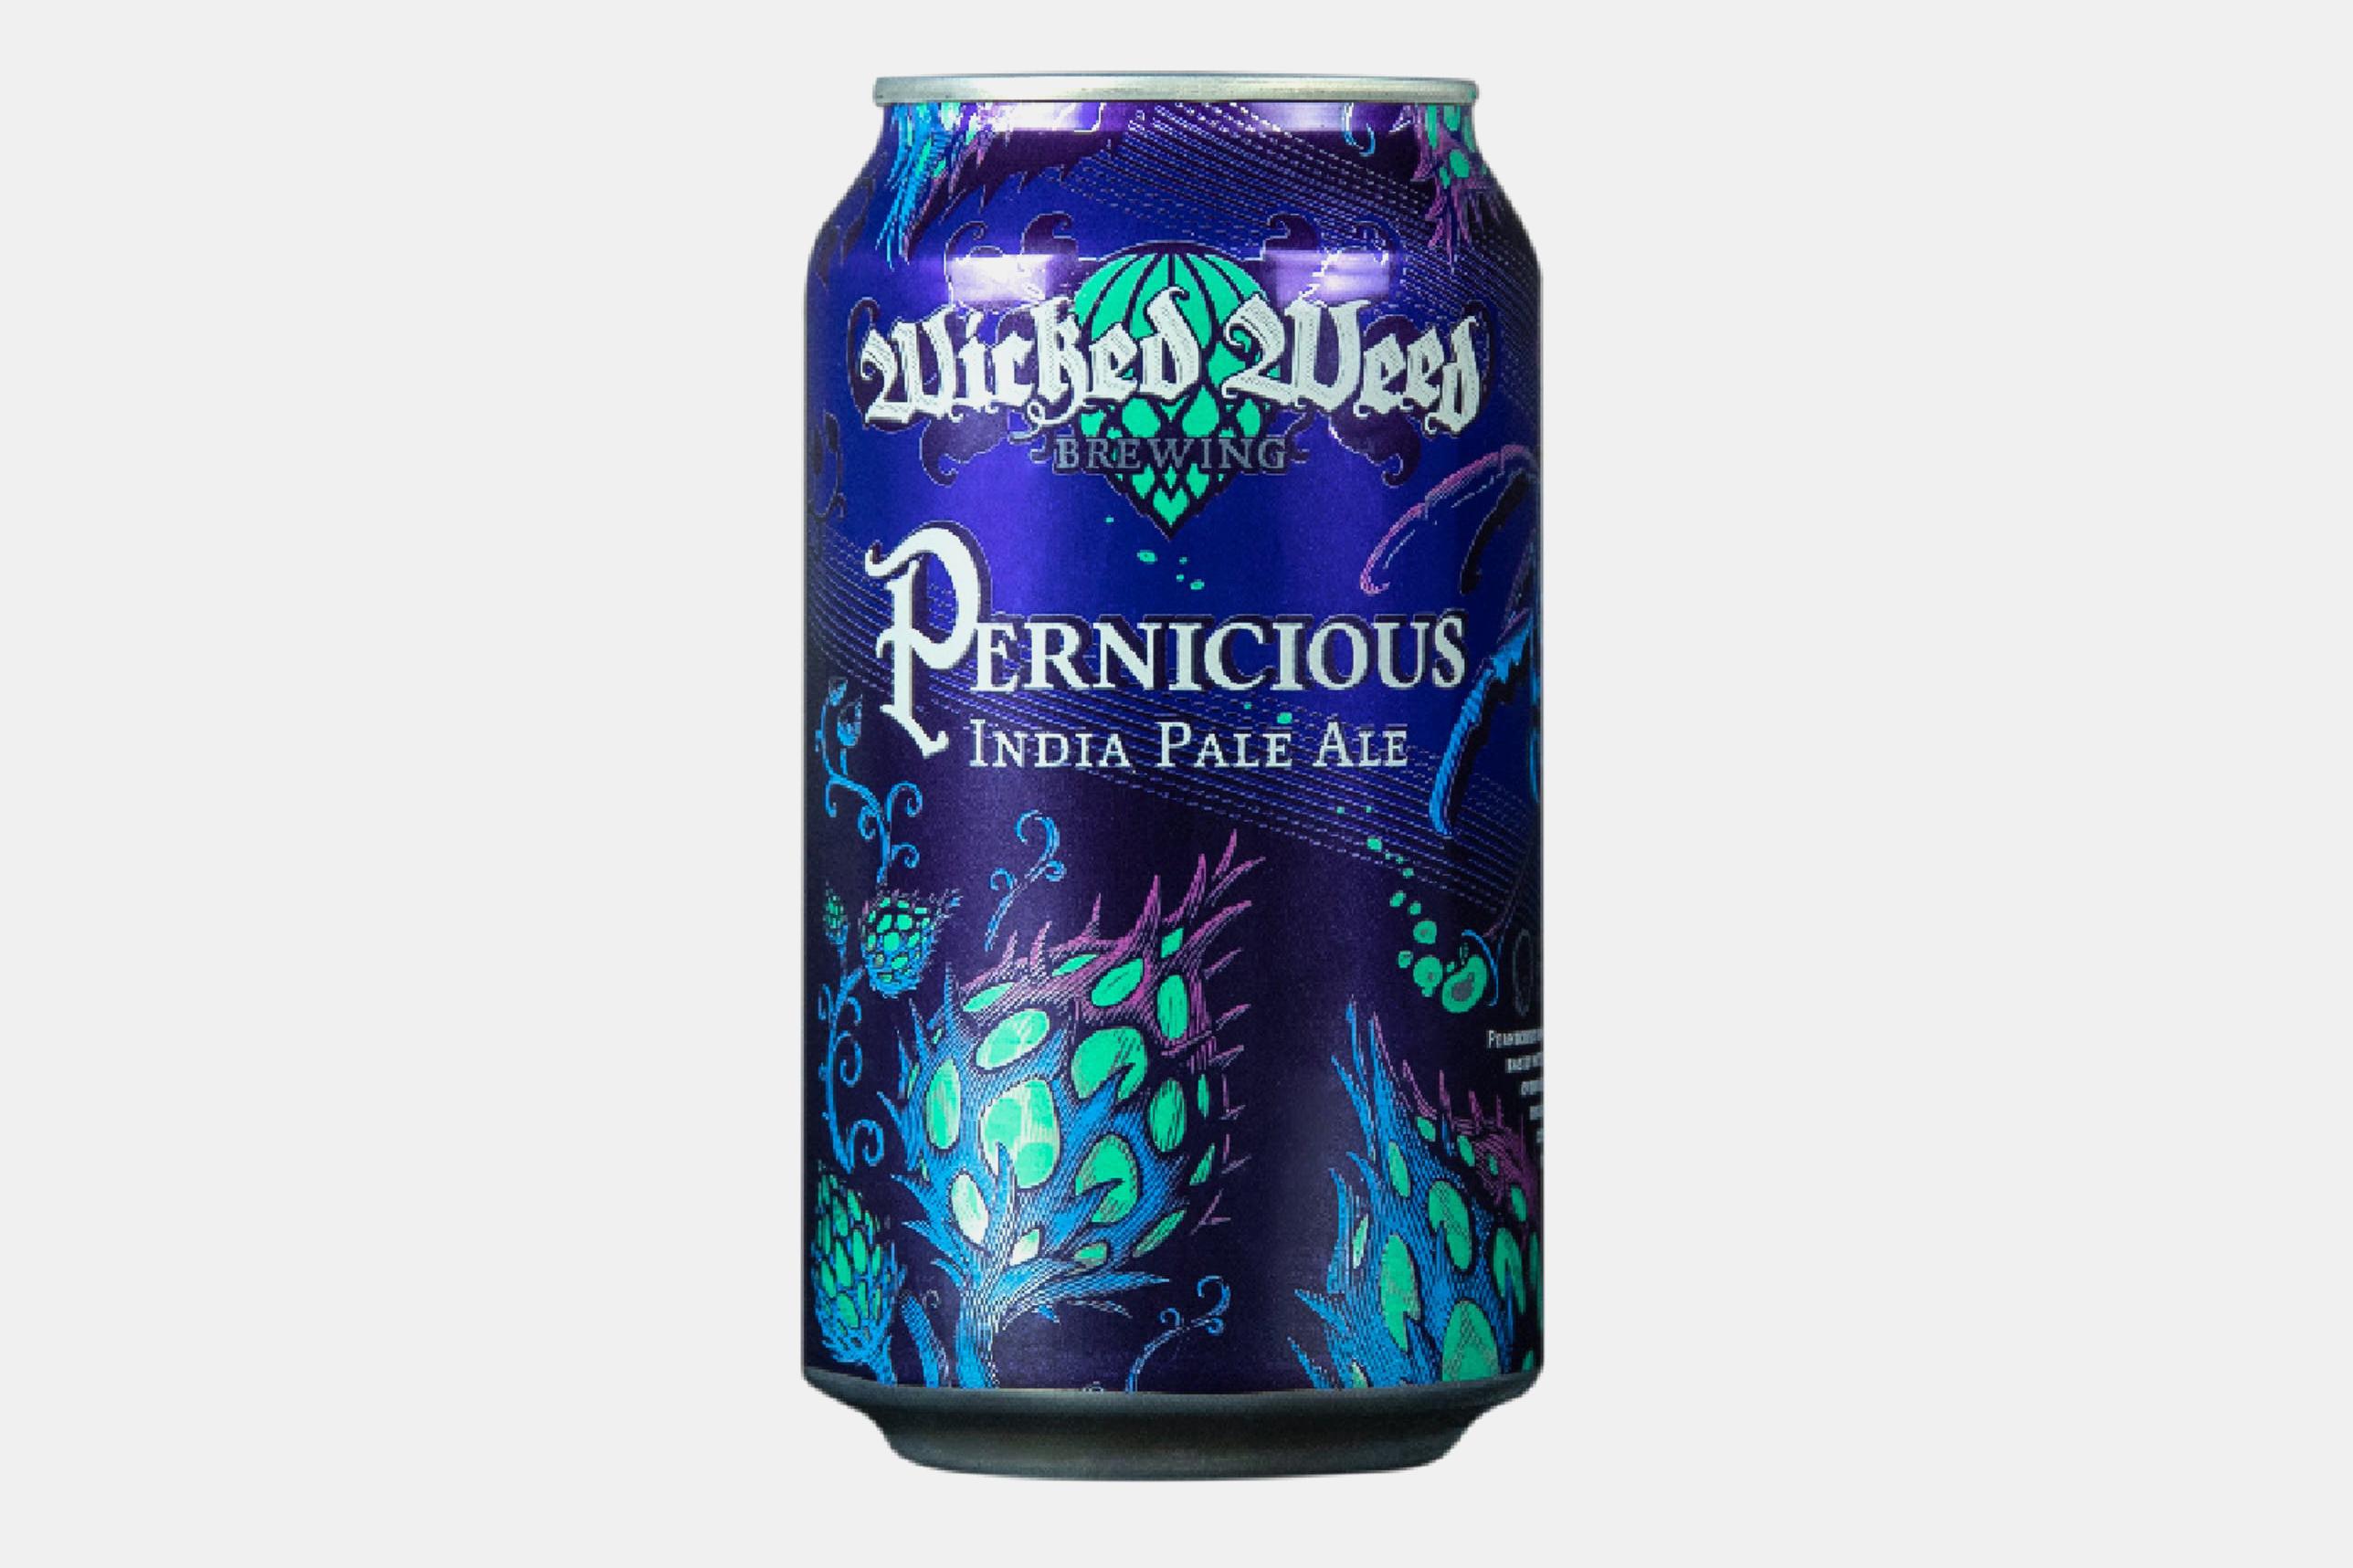 Wicked Weed Pernicious IPA